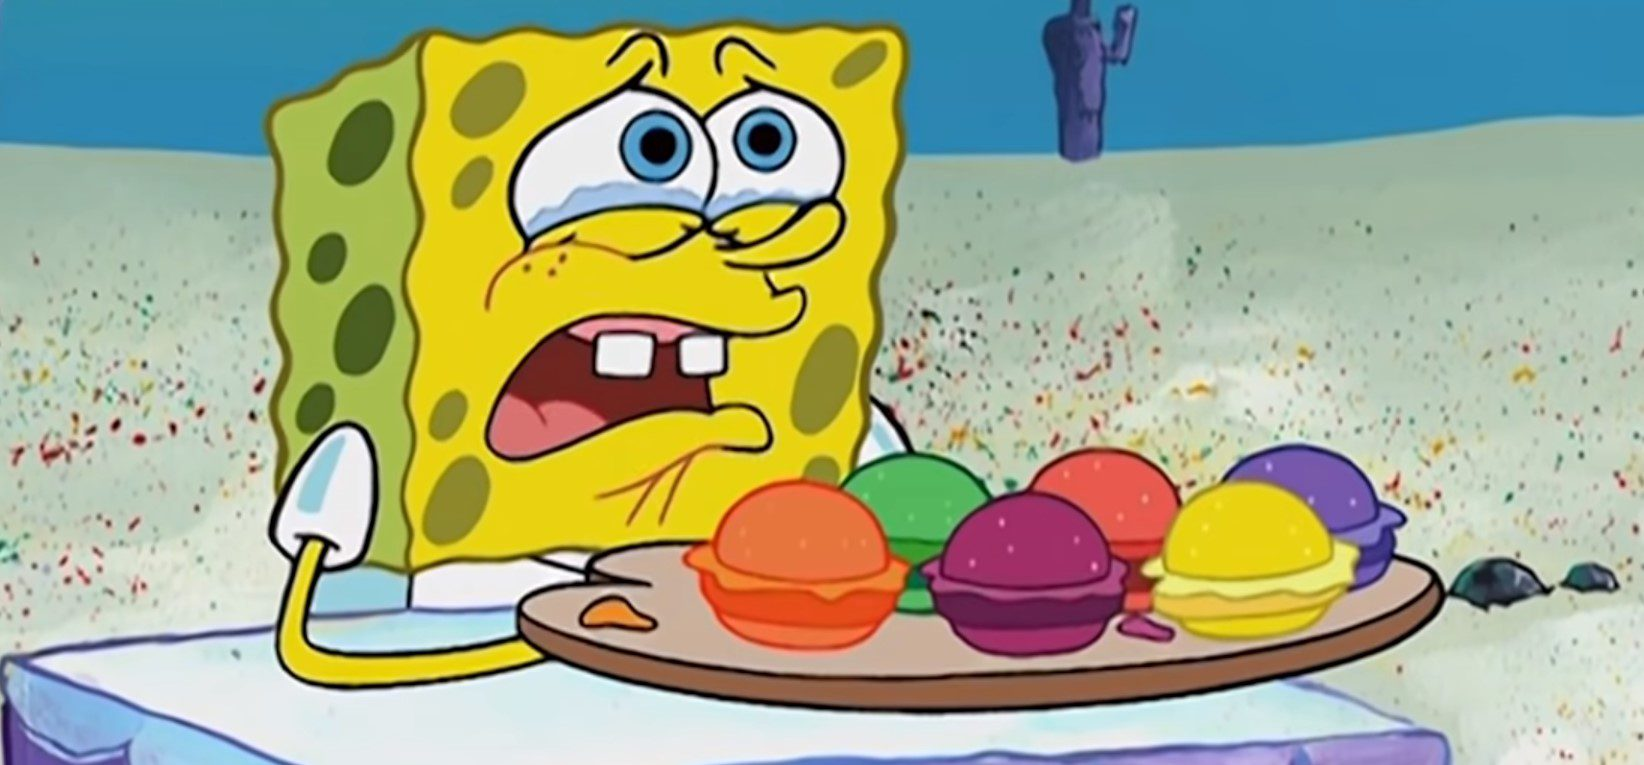 Krabby Patty Secret Ingredient